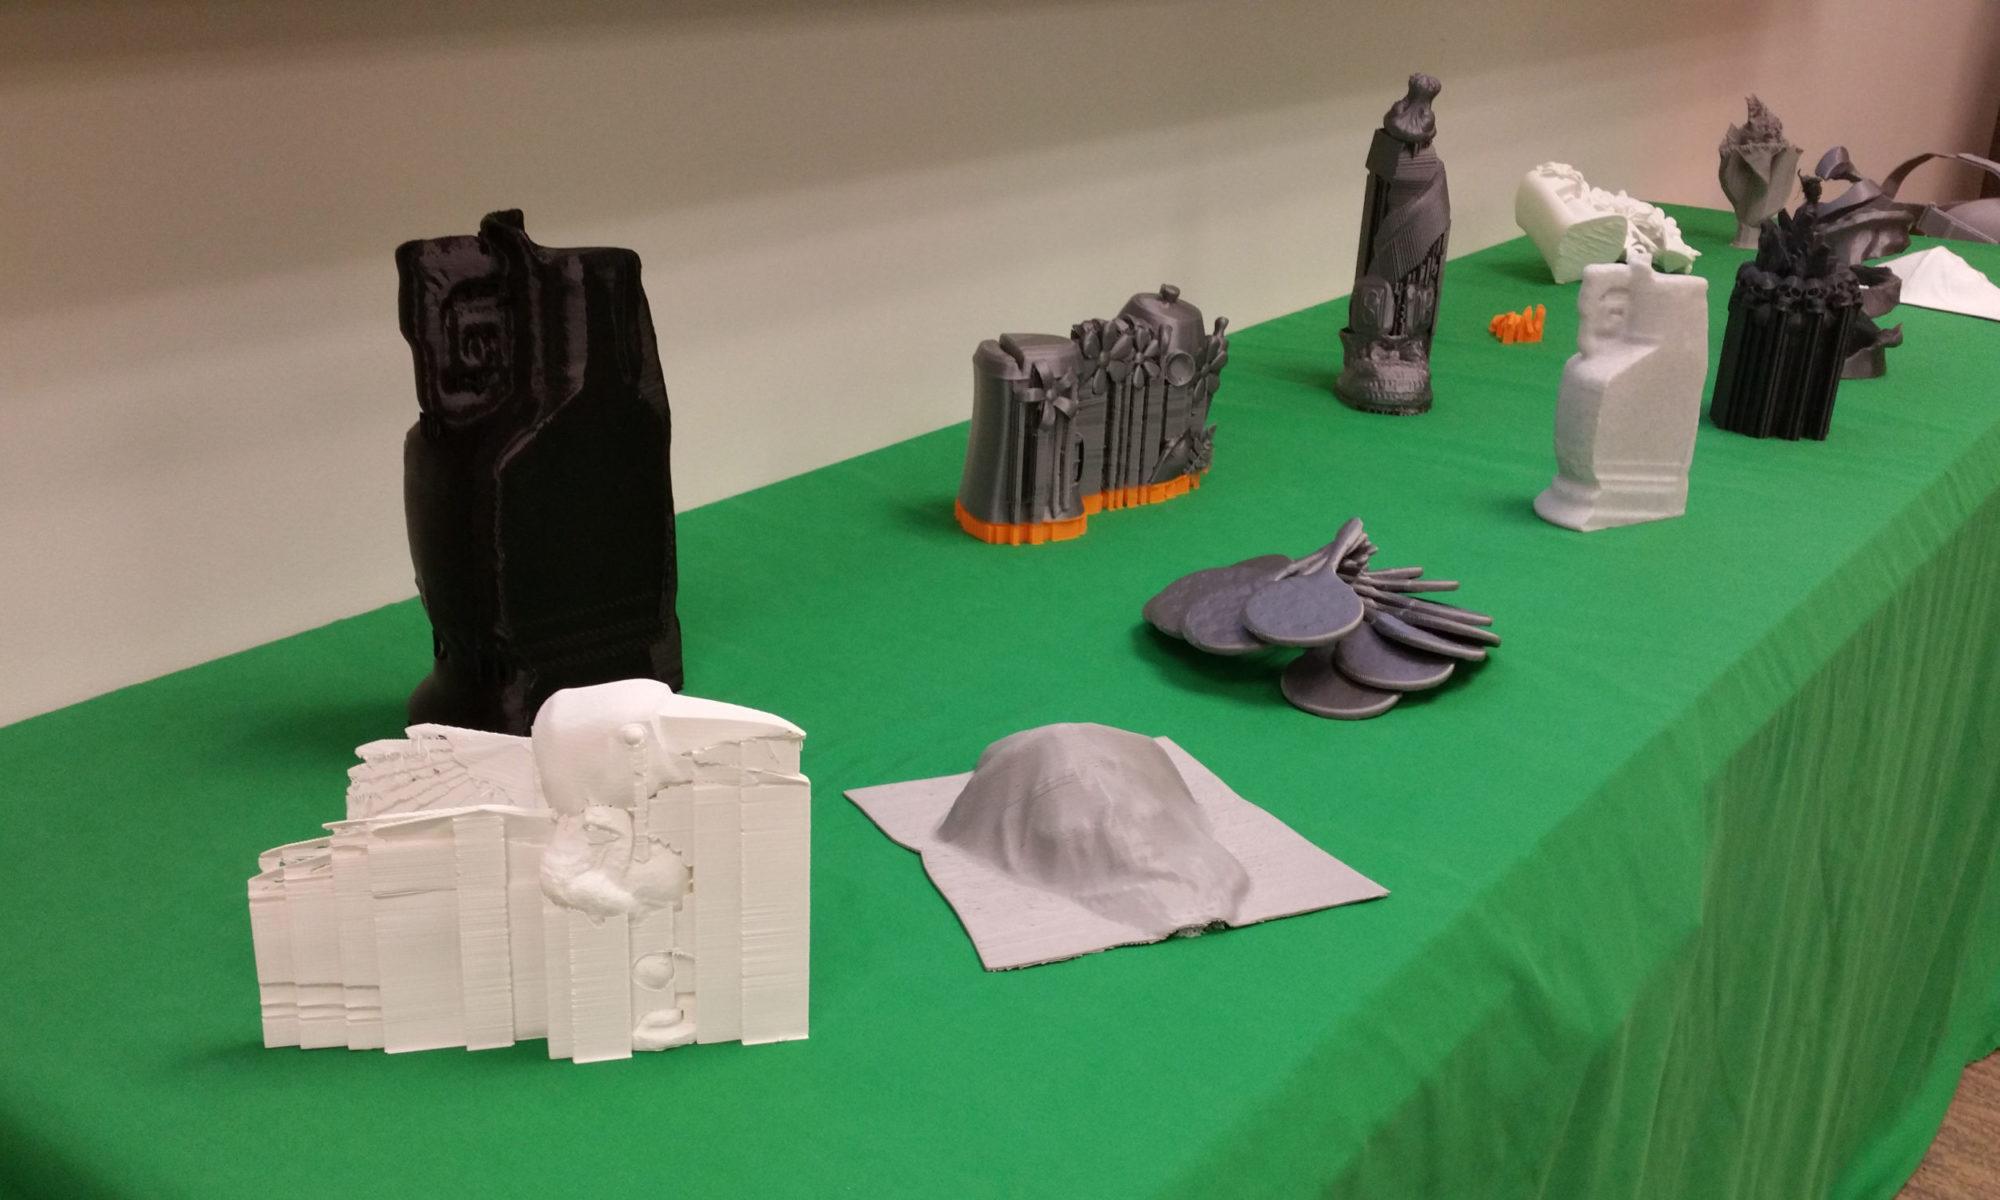 3D printed plastics artifacts